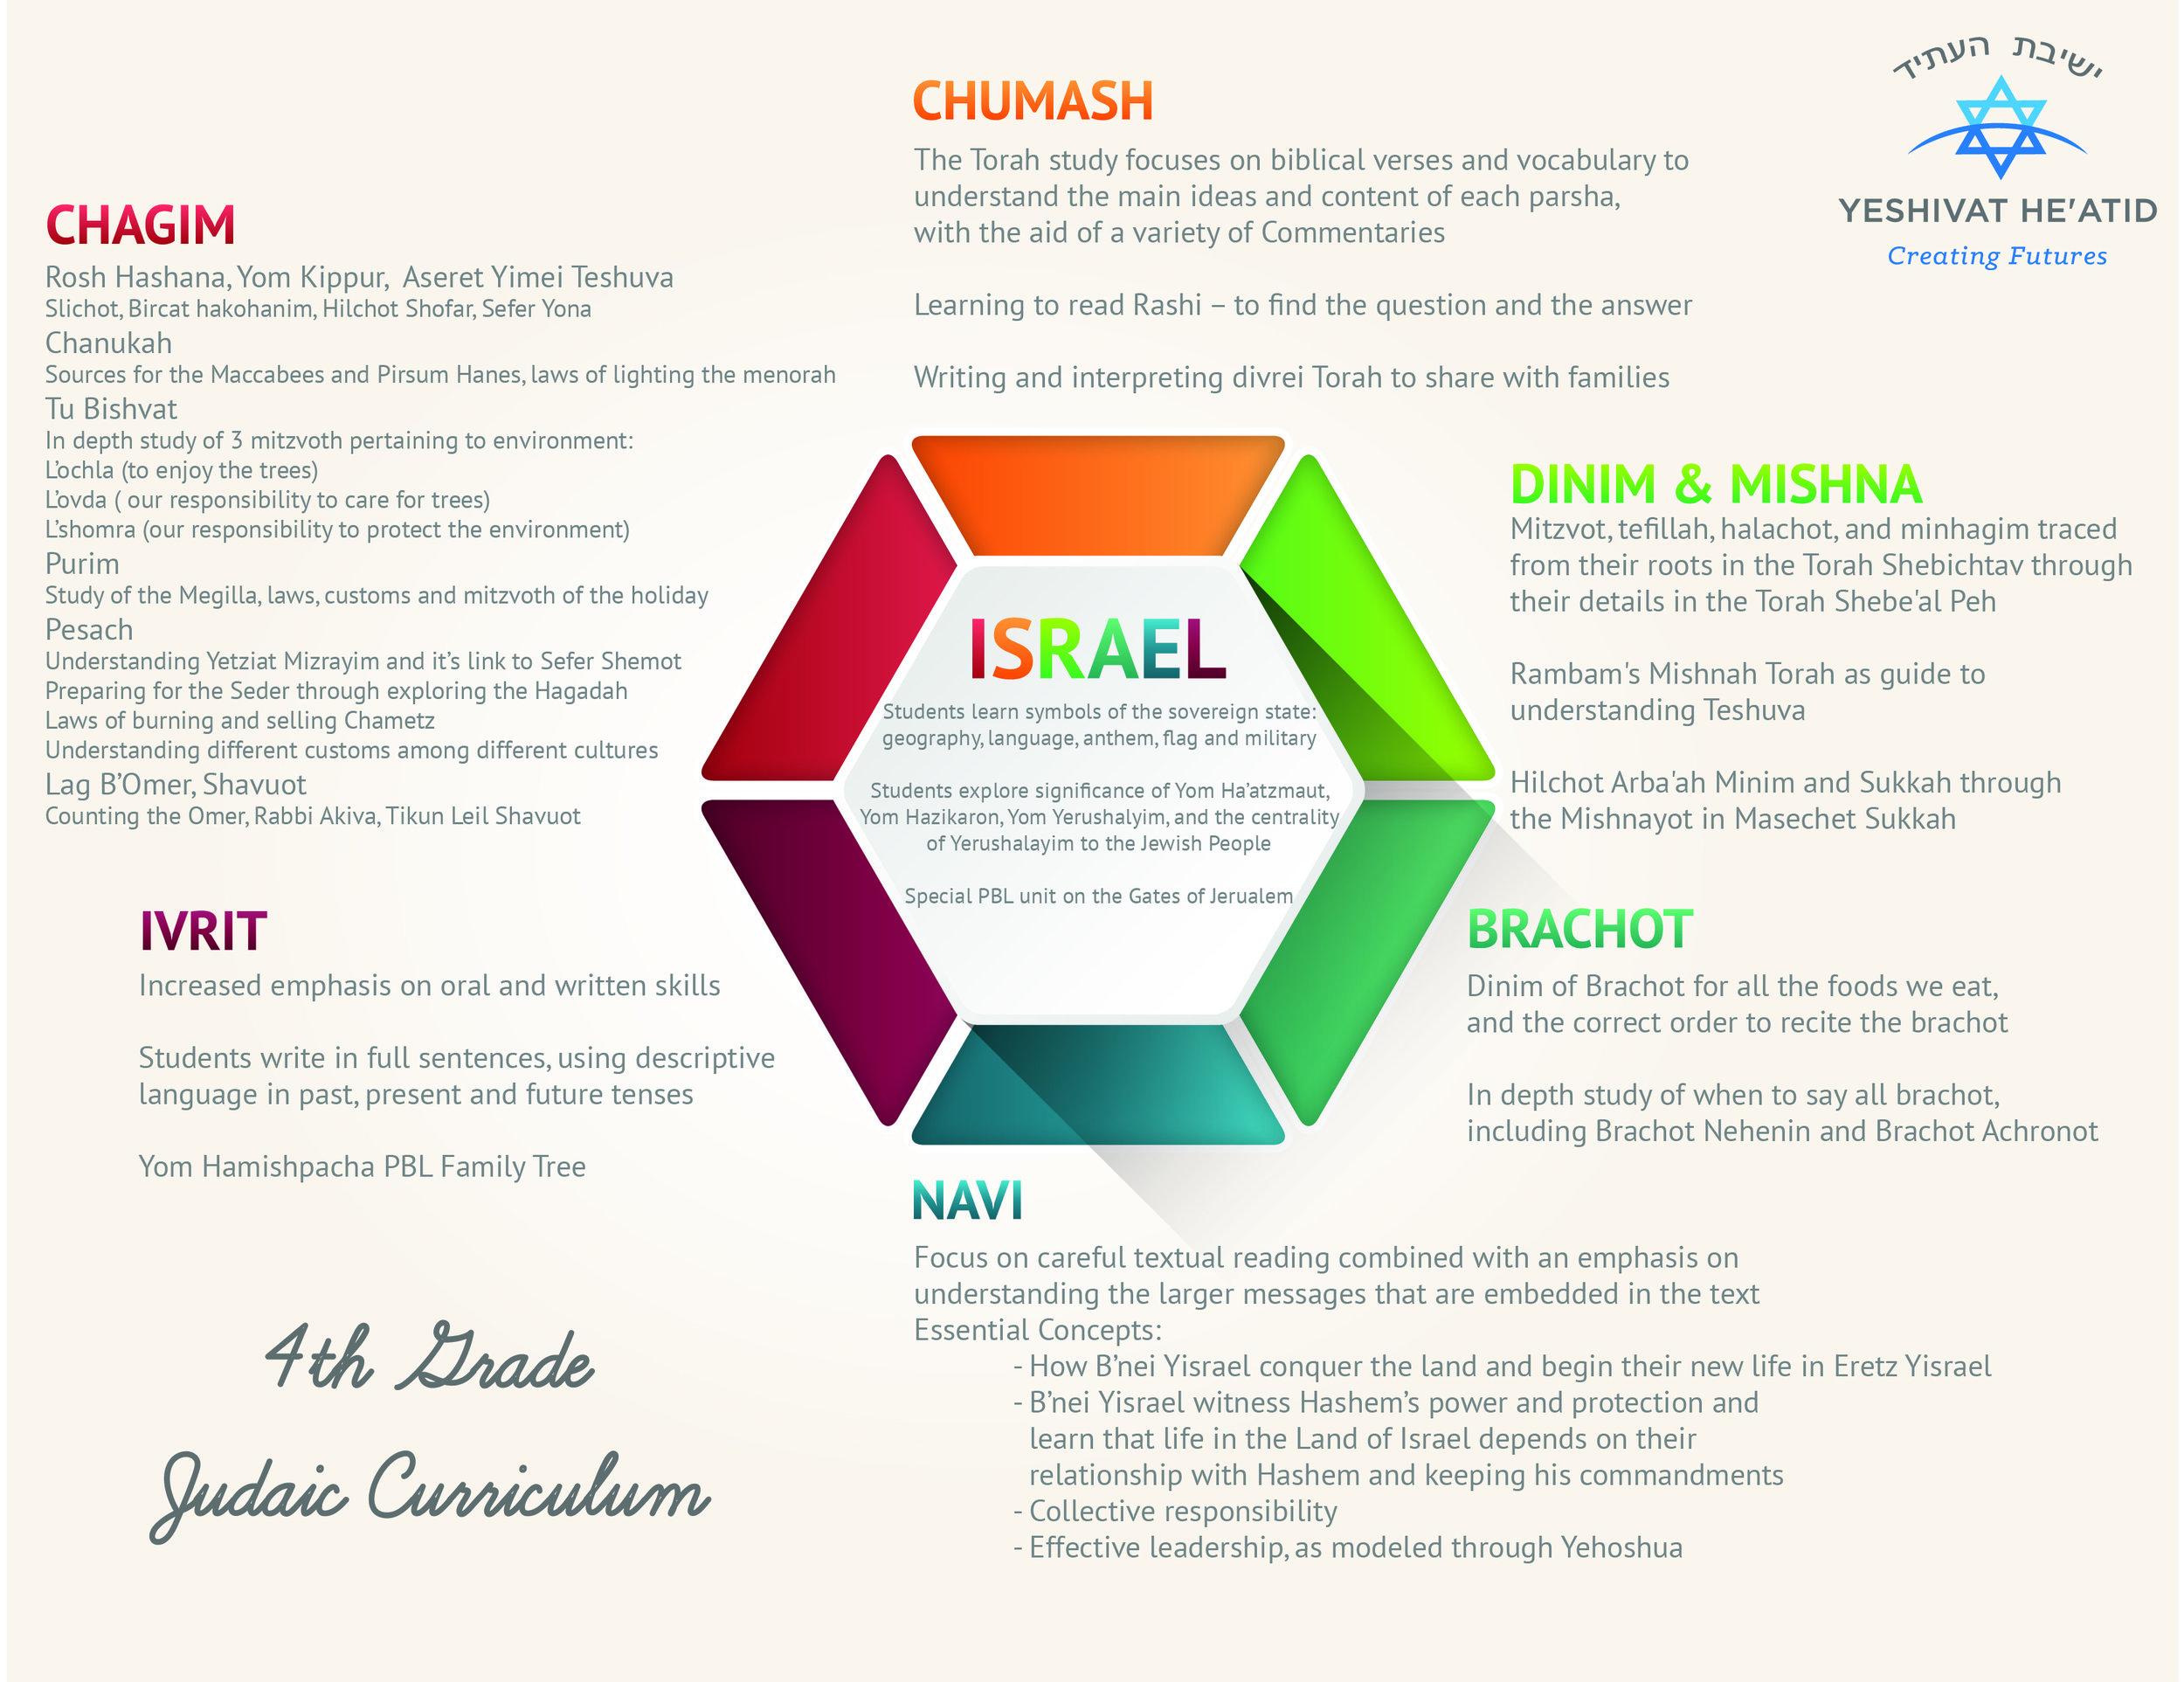 10- 4th Grade Judaic Curriculum.jpg